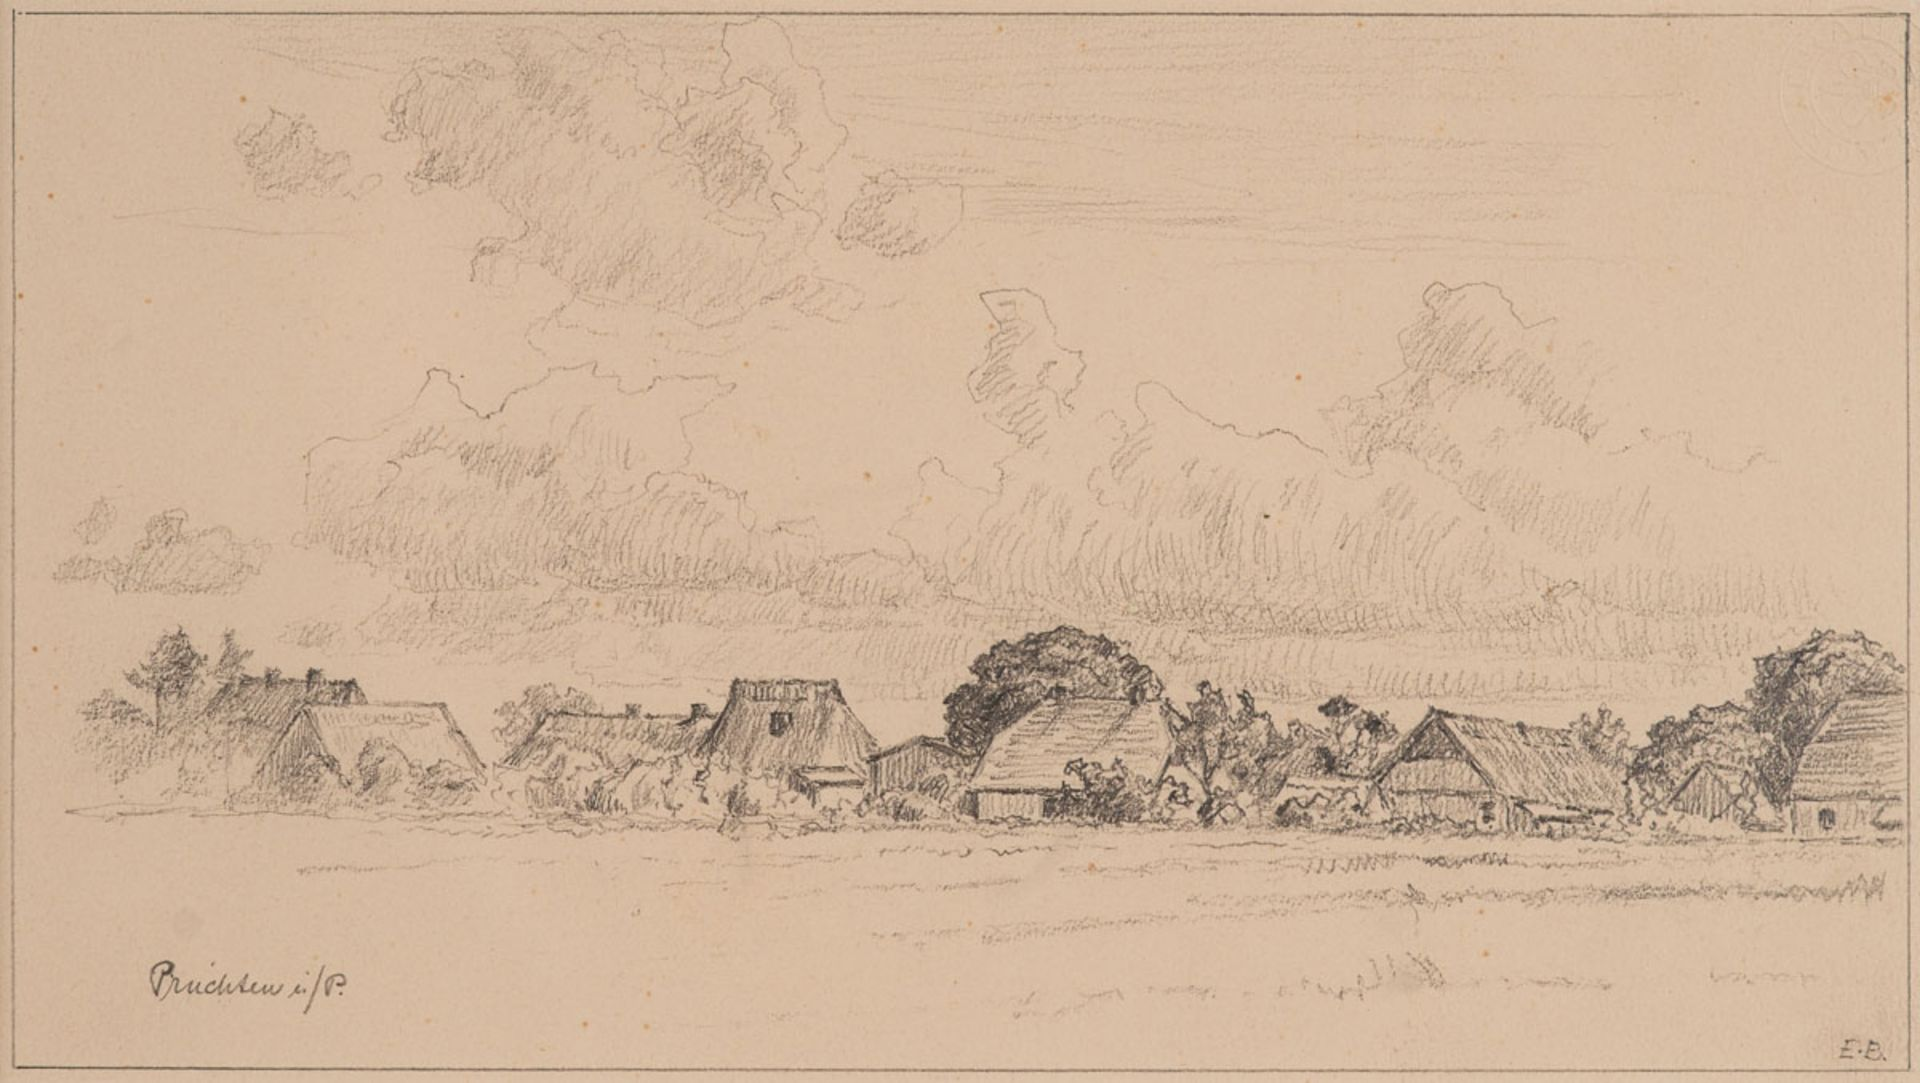 Elisabeth Büchsel – Pruchten in Pommern. o. J.